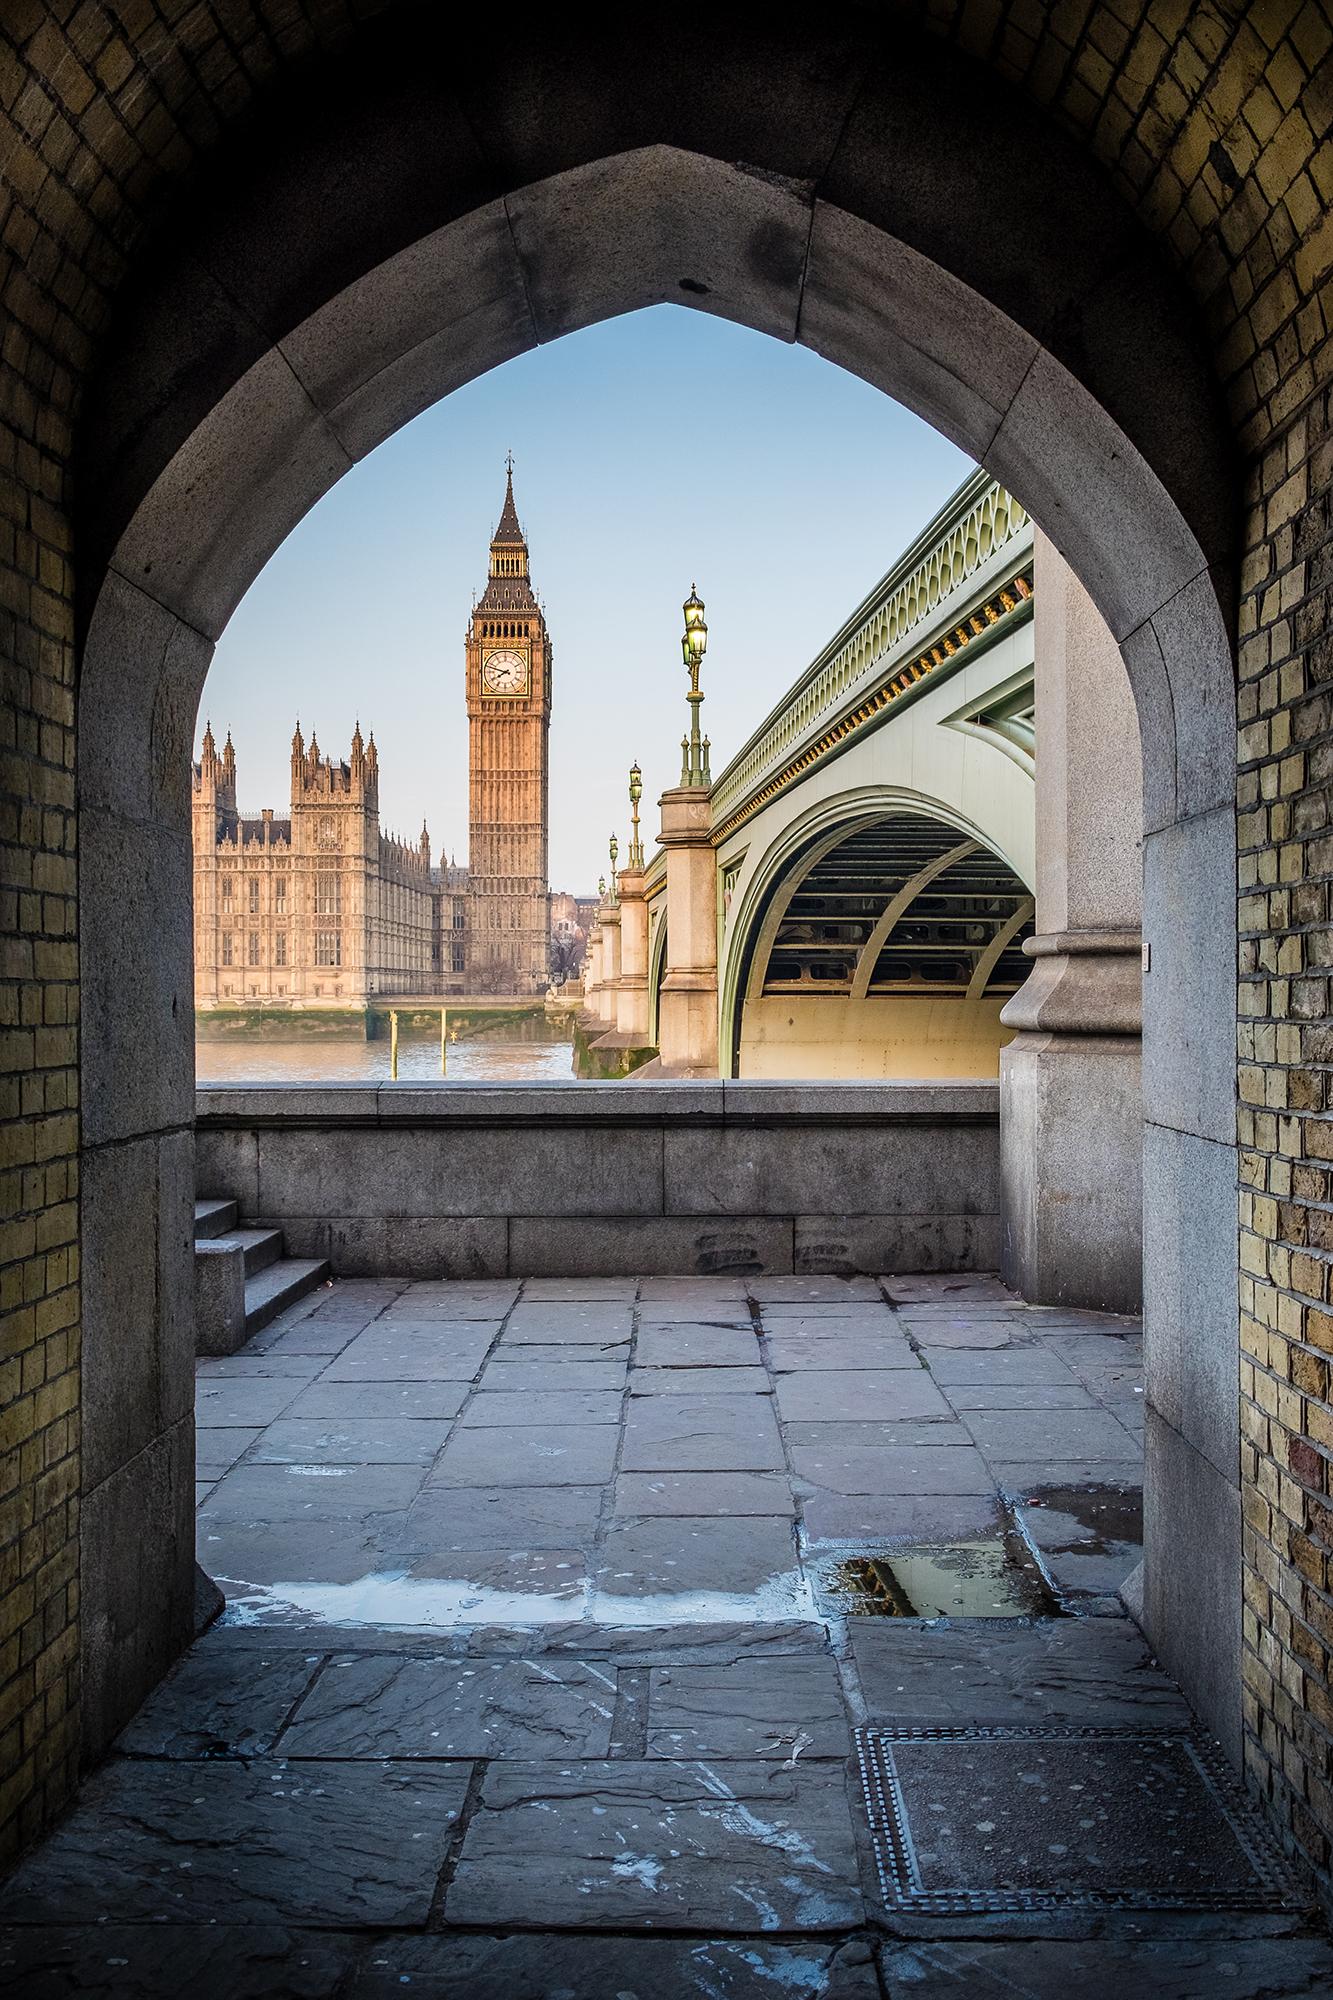 A photo of Big Ben taken from underneath Westminster Bridge taken by Trevor Sherwin